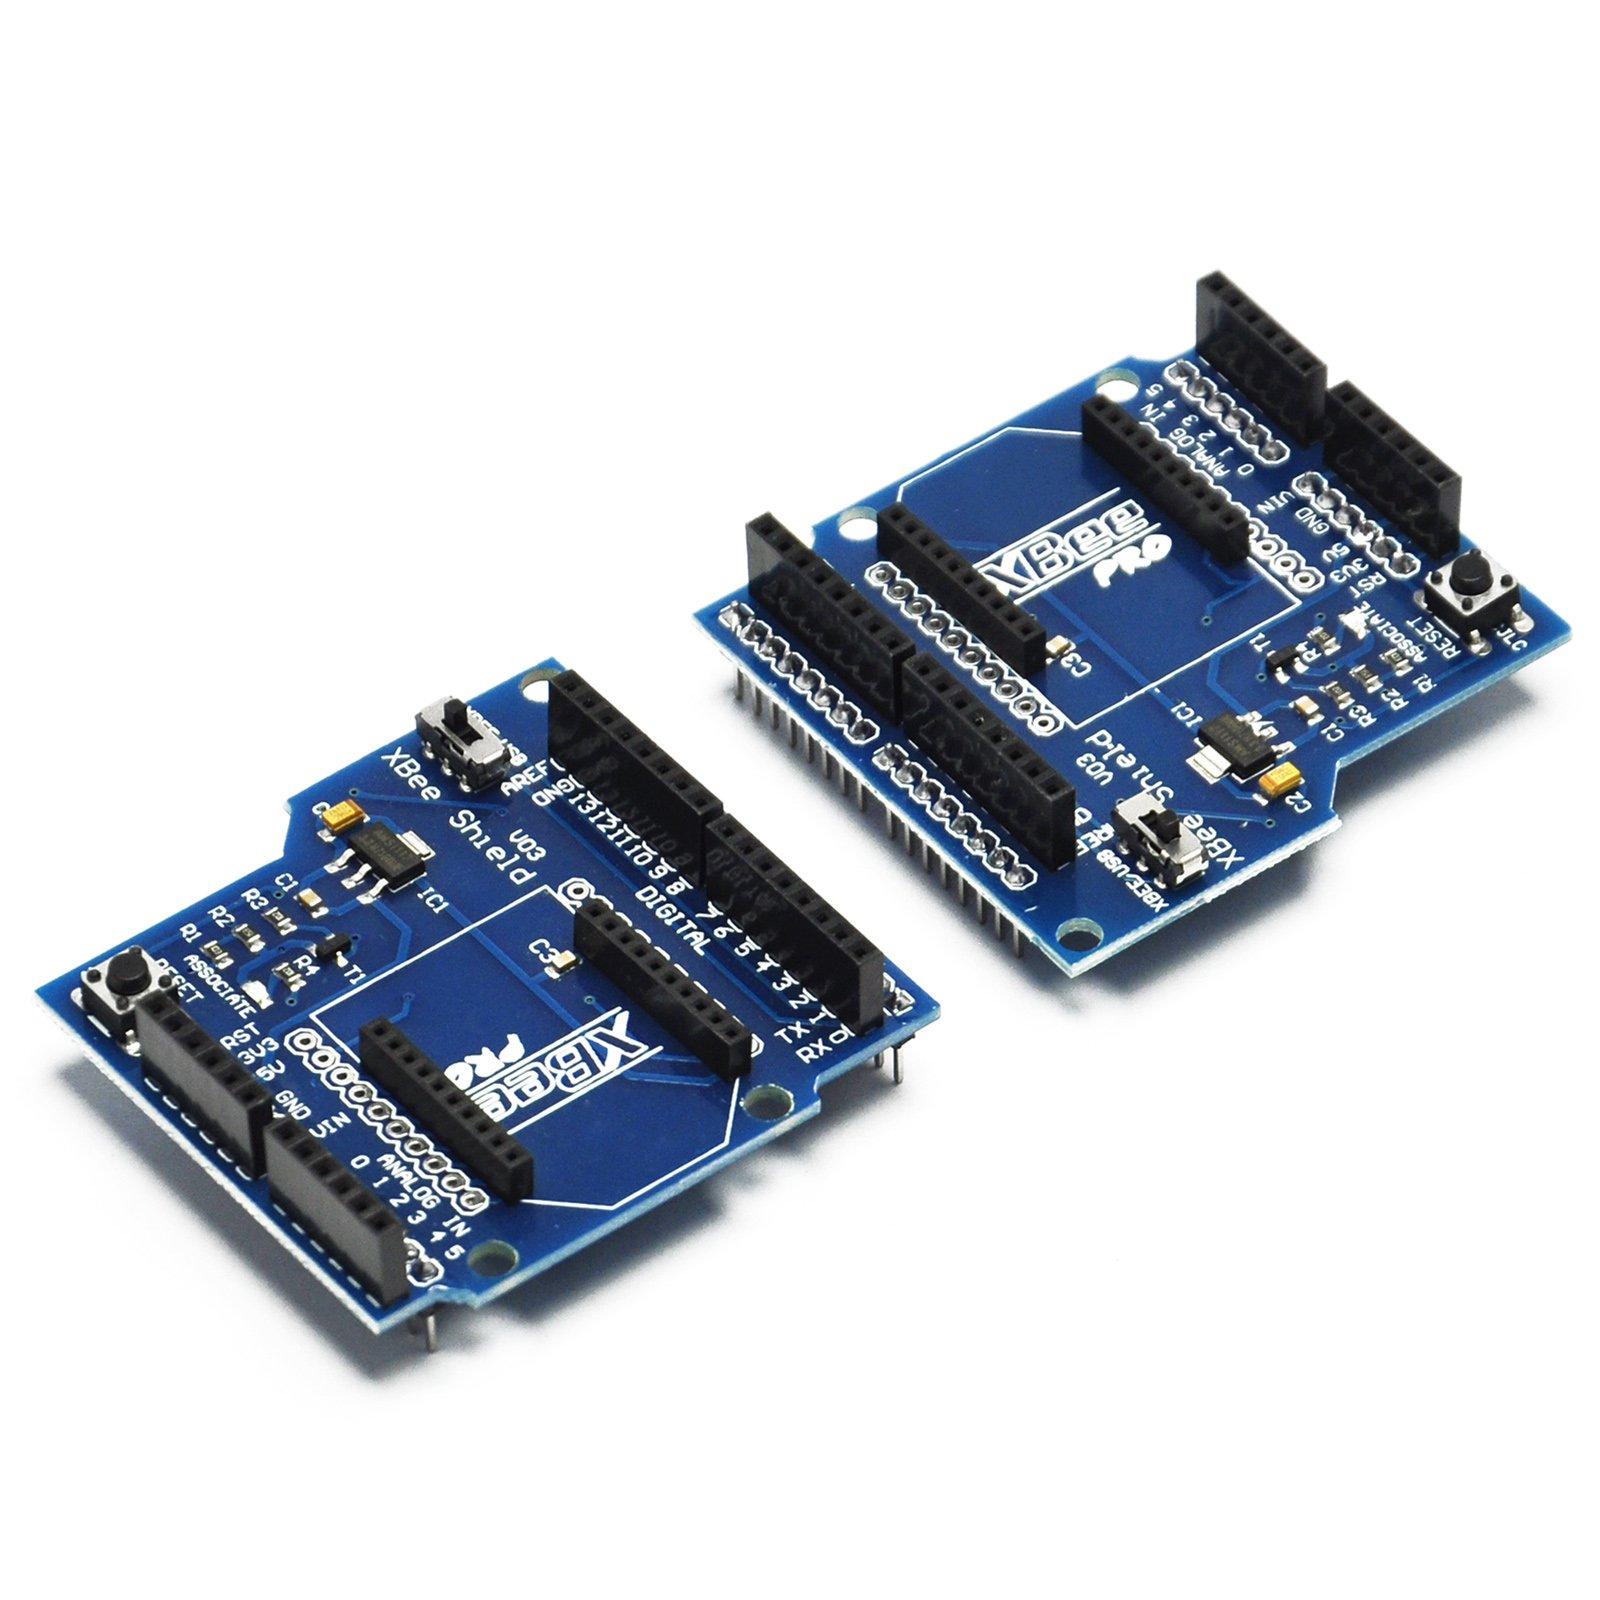 Gikfun Bluetooth XBee Shield V03 Module Wireless Control For ZigBee Arduino (Pack of 2pcs) EK1185x2